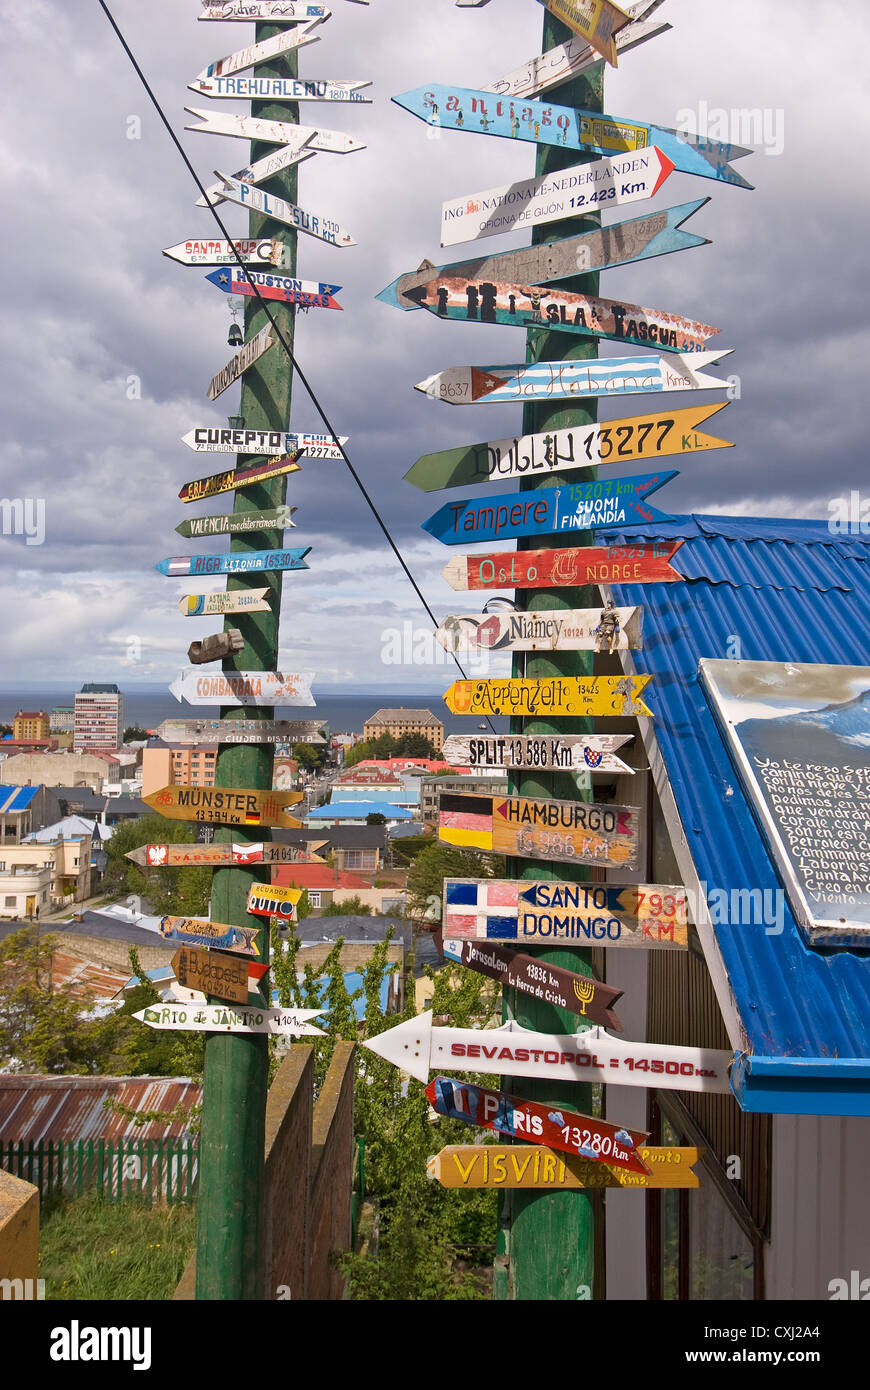 Elk198-4092v Chili, Patagonie, Punta Arenas, café Mirador, signes de distance Photo Stock